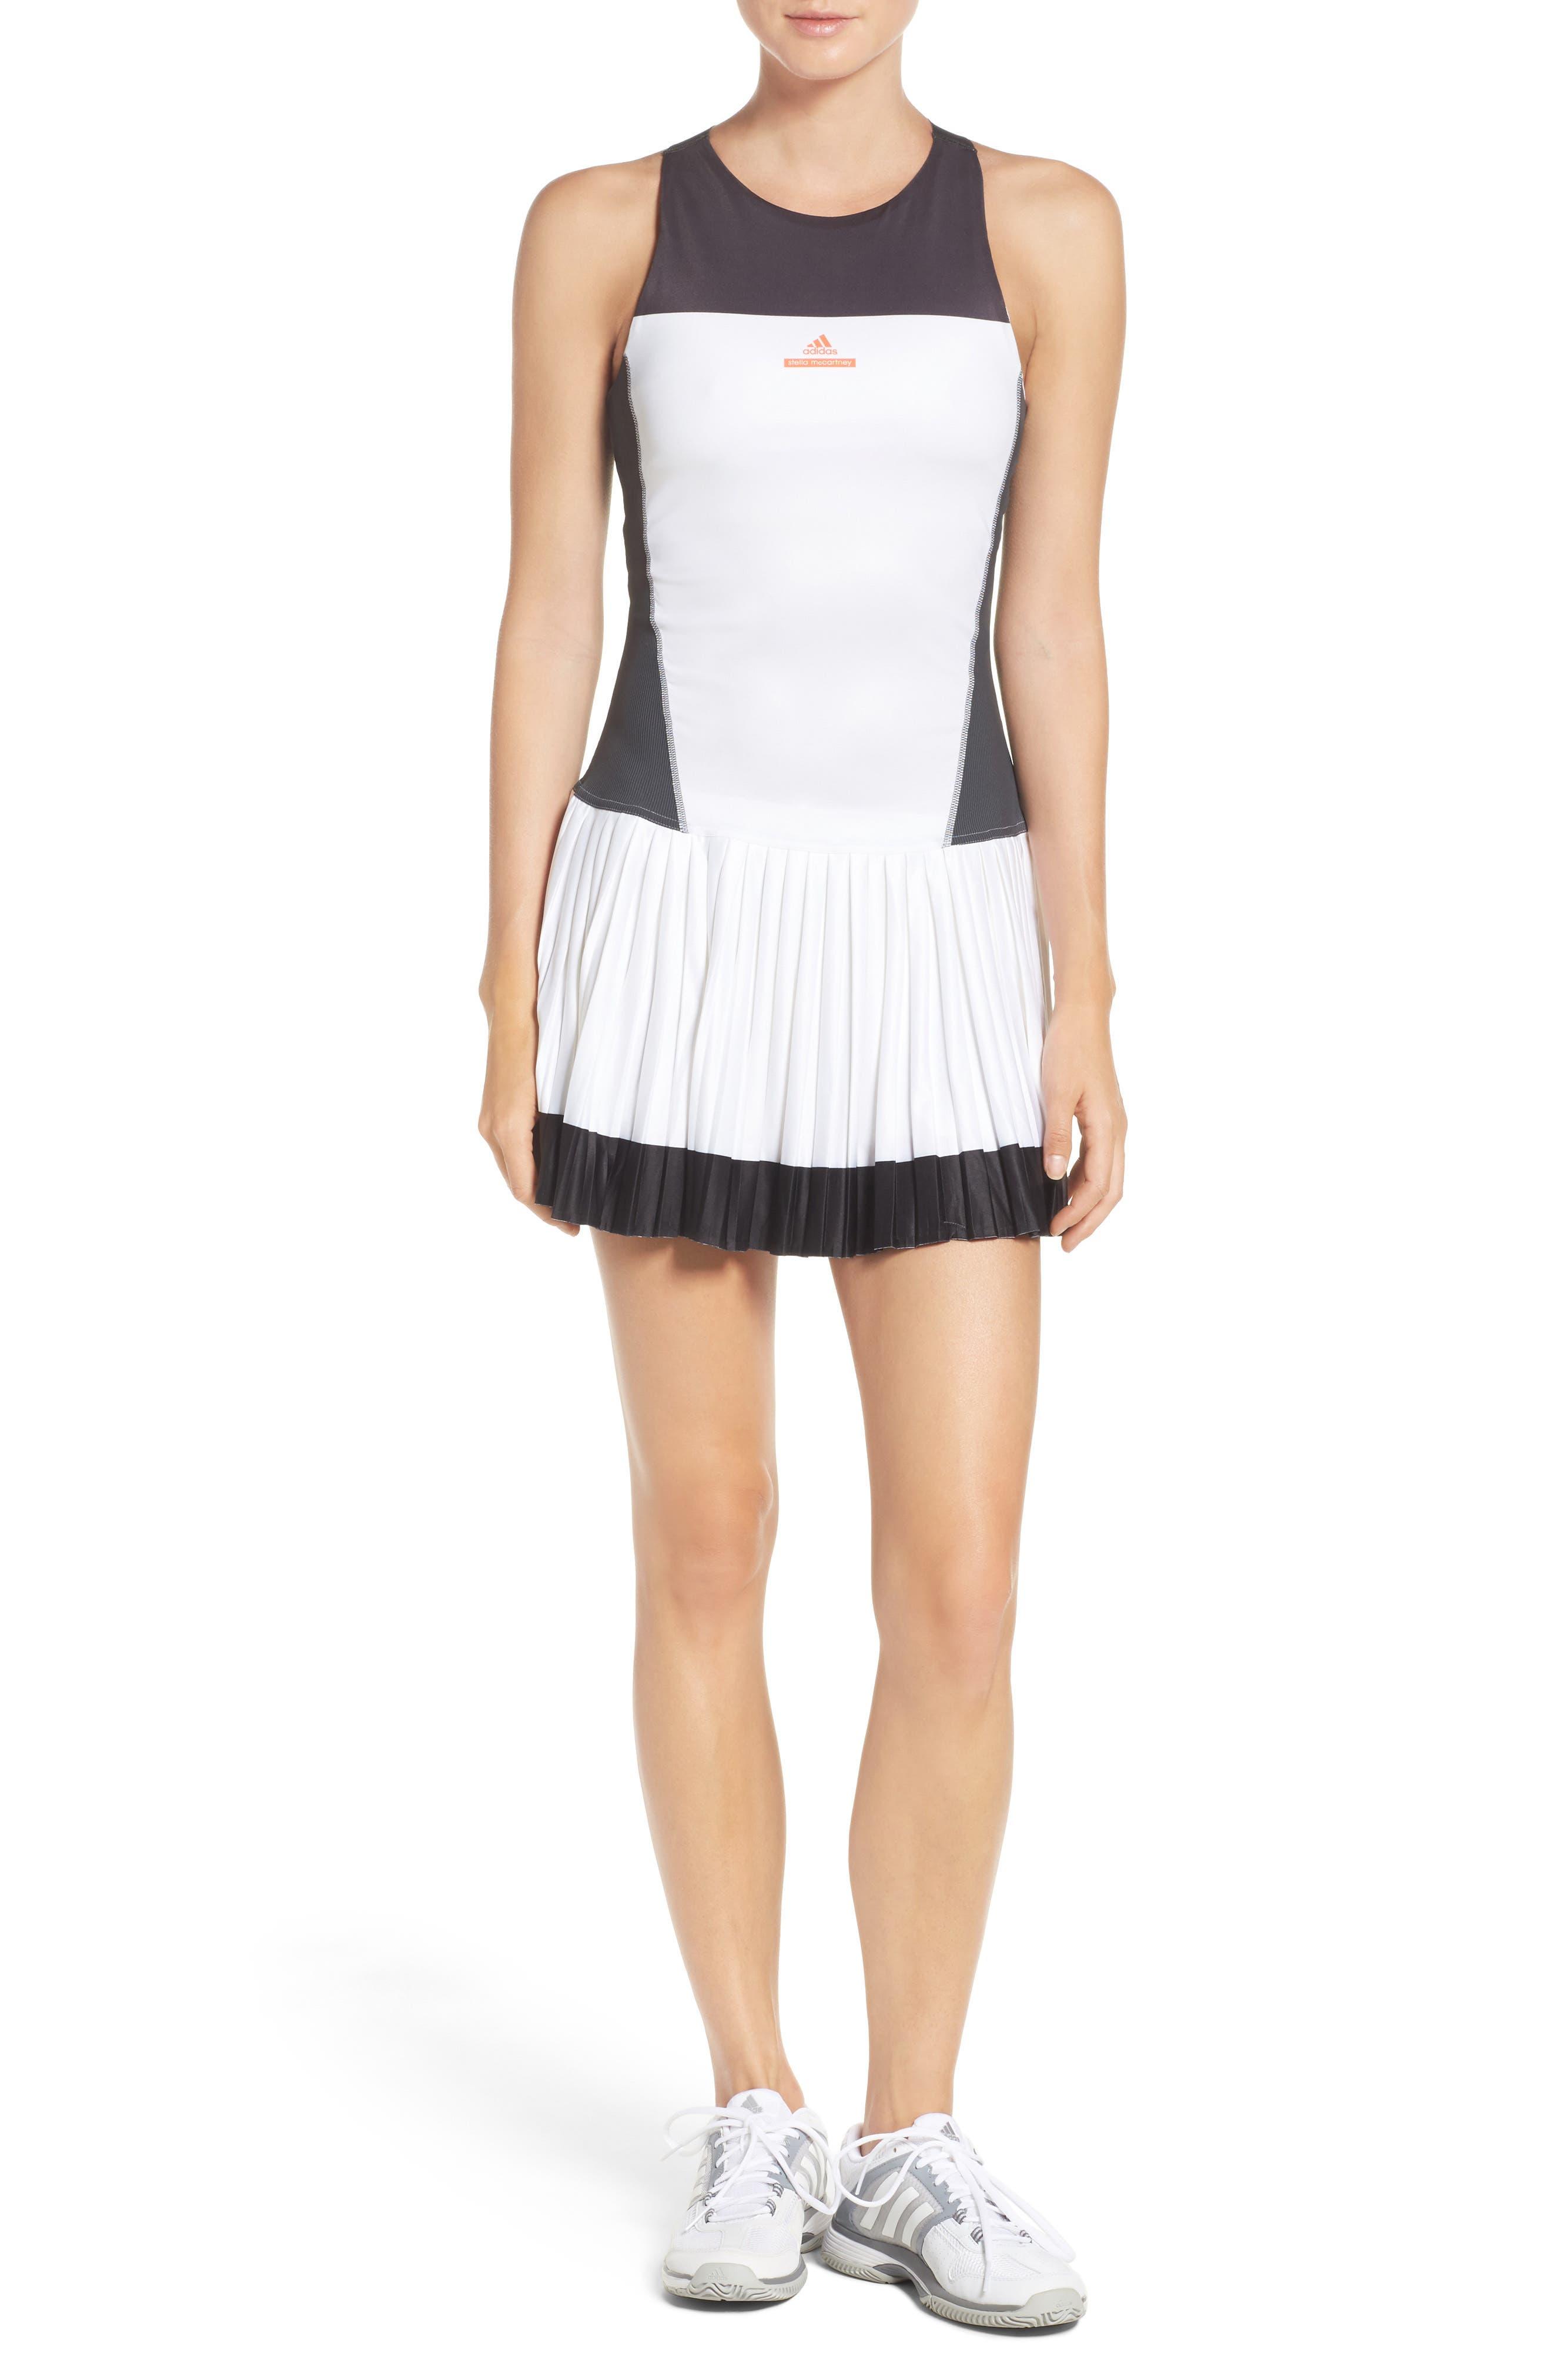 Barricade Tennis Dress & Shorts Set,                             Main thumbnail 1, color,                             White/ Solid Grey